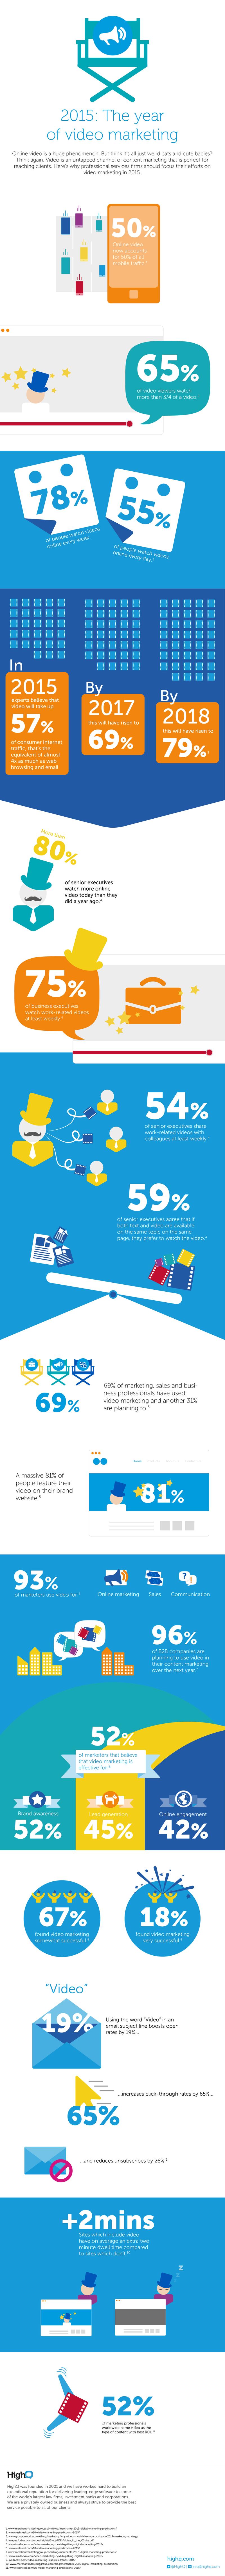 video marketing 2015